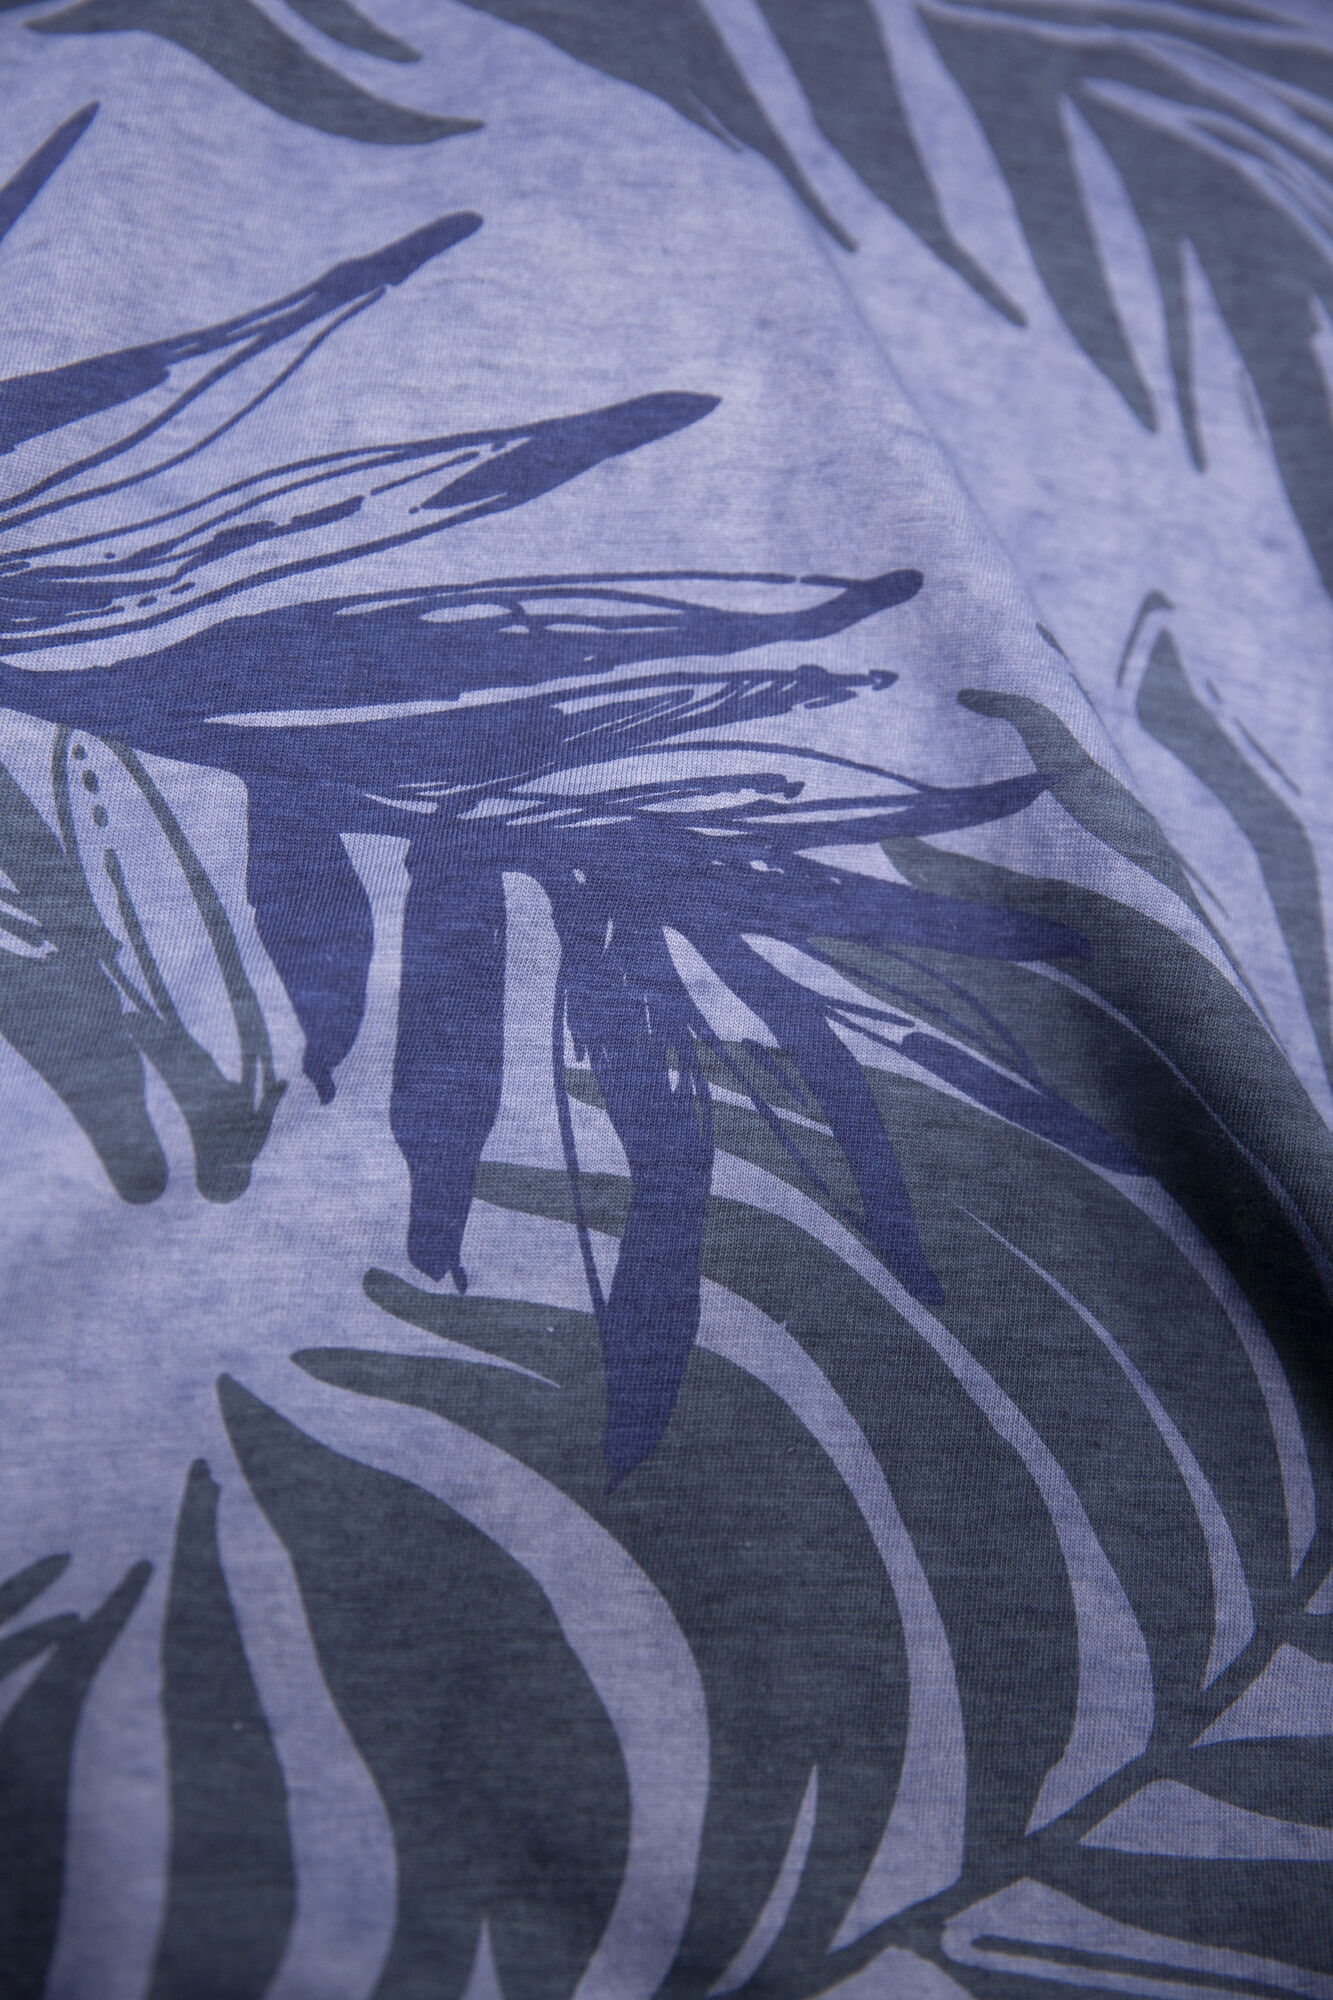 Garcia Herren T-Shirt Shirt kurzarm blau Palmen Muster E11004 4962 Denim Blue